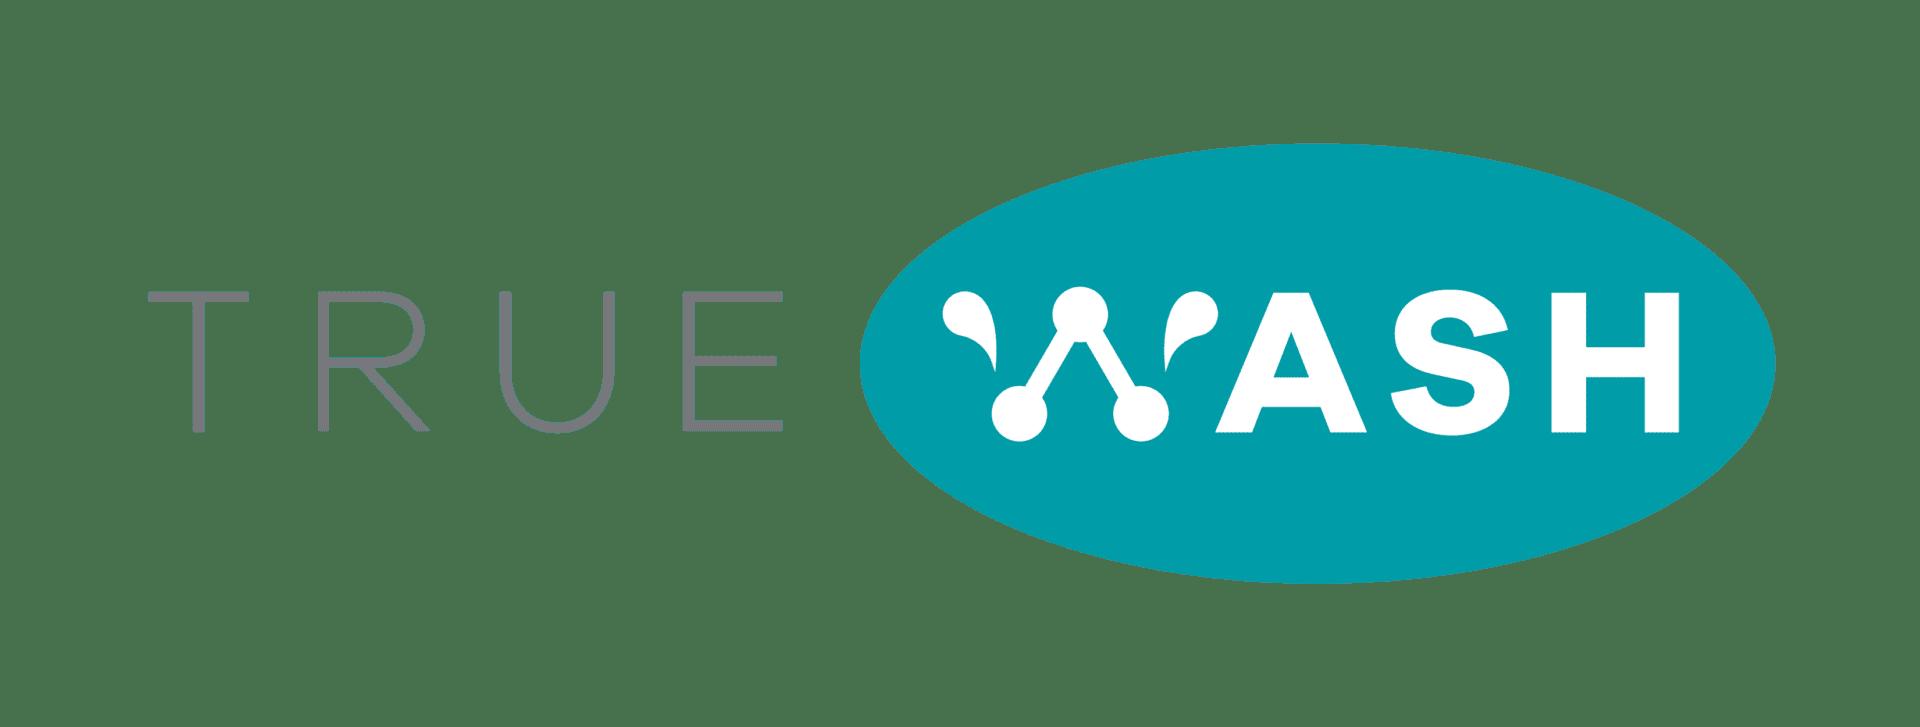 https://eglobalnv.com/wp-content/uploads/2020/05/TrueWash-Logo-Full-Color.png